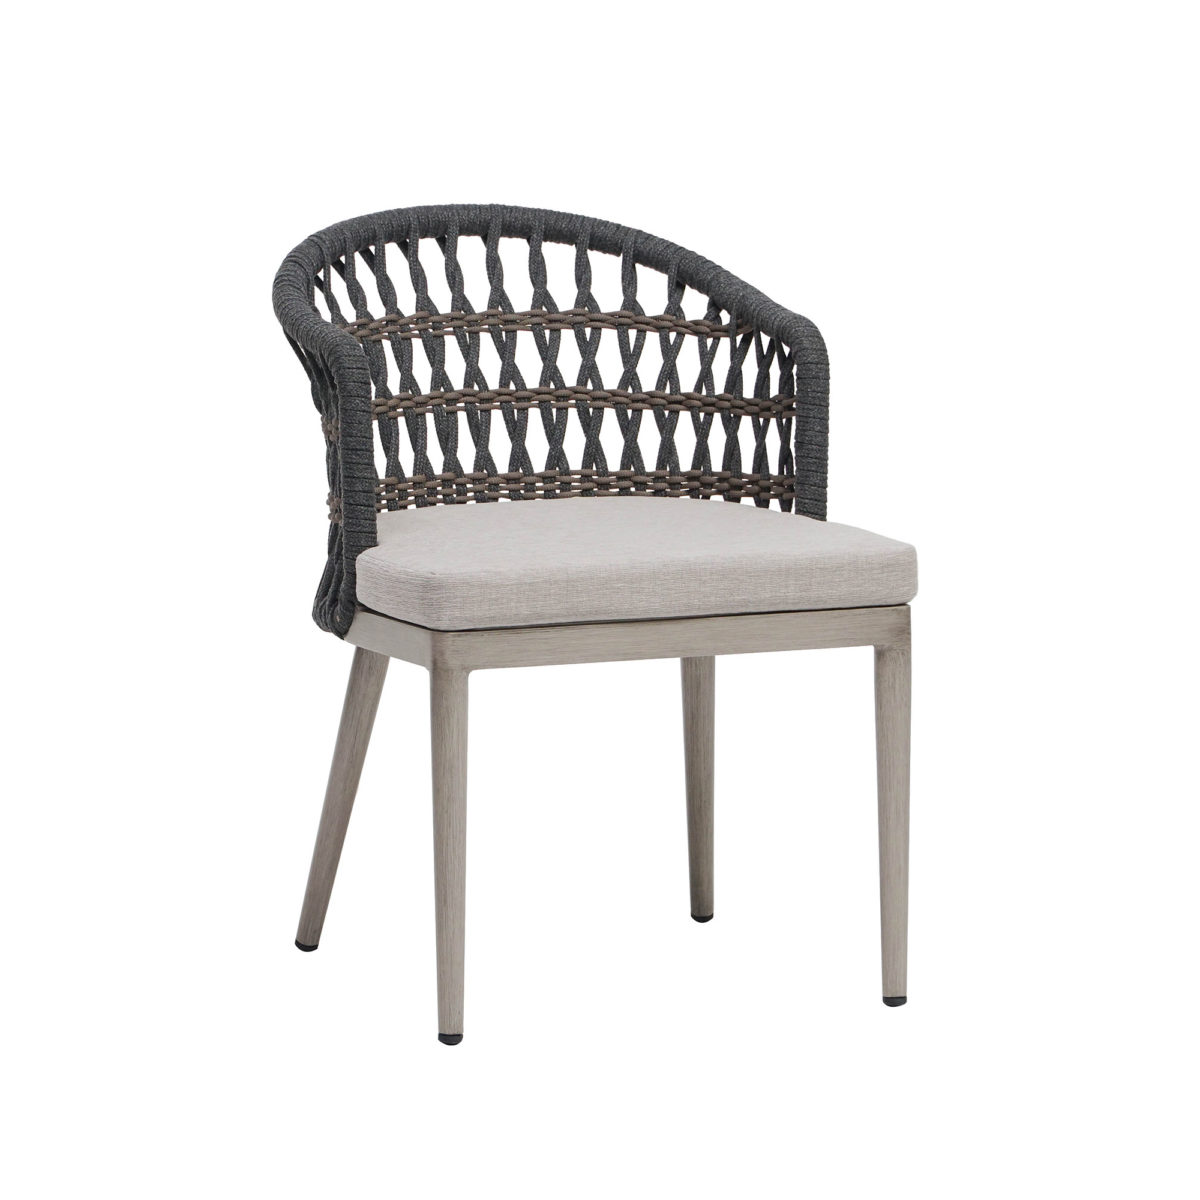 The Coconut Grove dining chair by Ratana.